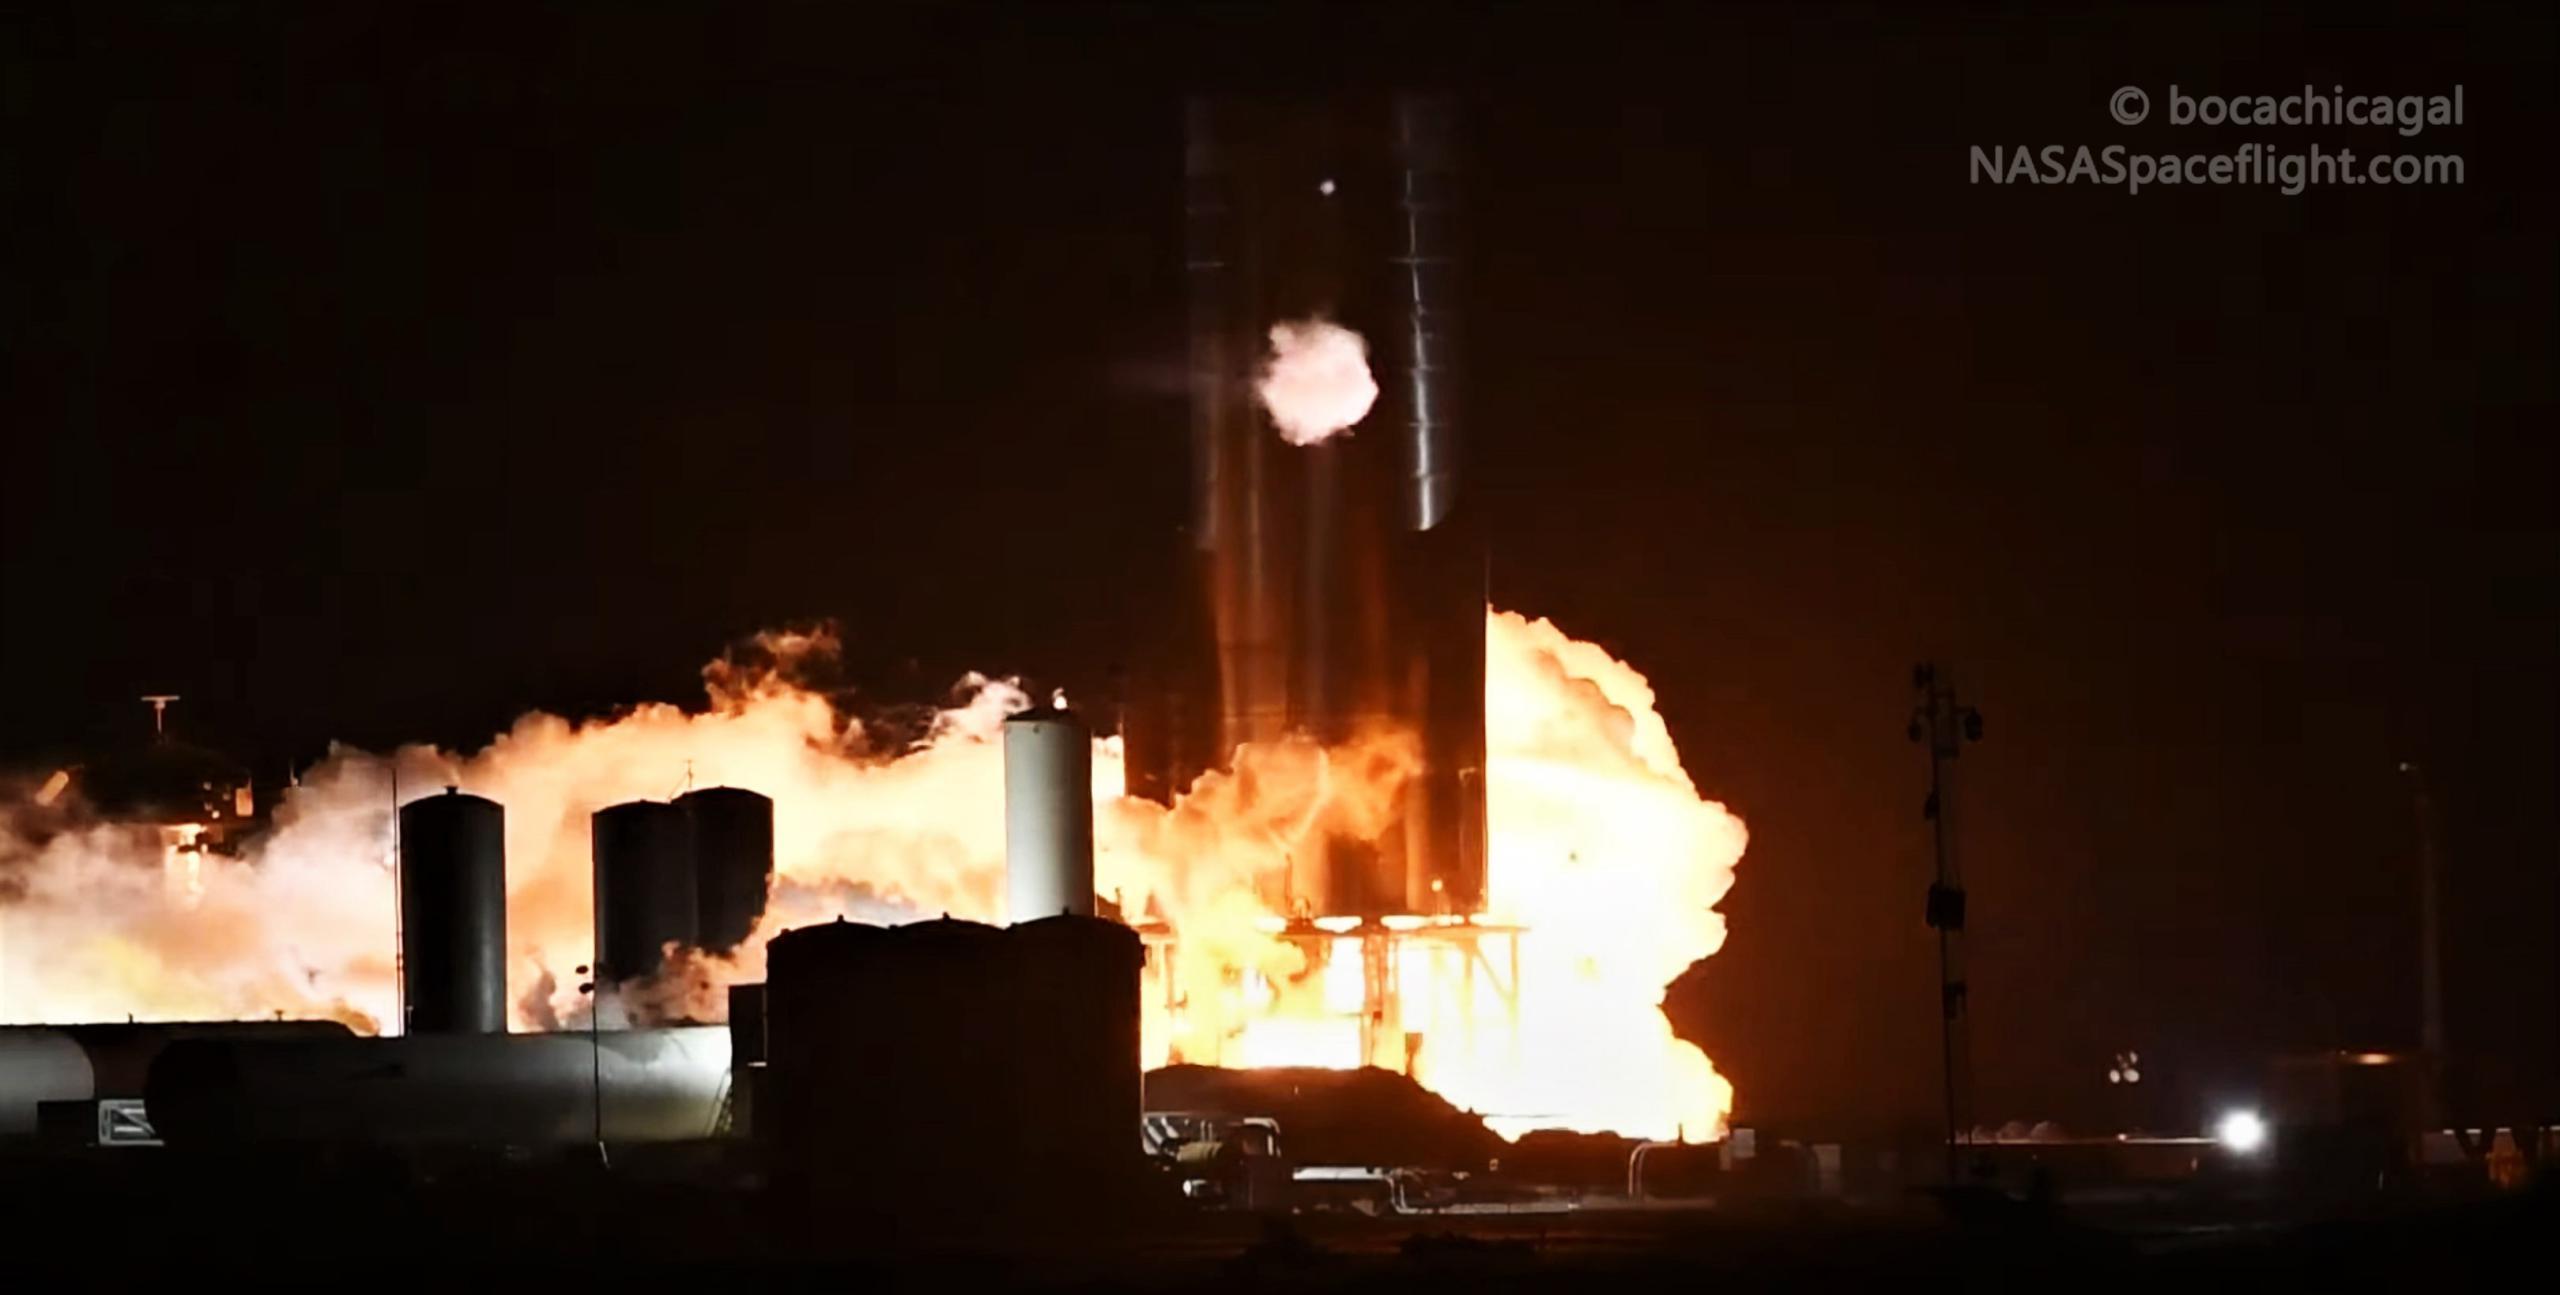 Starship Boca Chica 101920 (NASASpaceflight – bocachicagal) SN8 preburner test 4 (c)